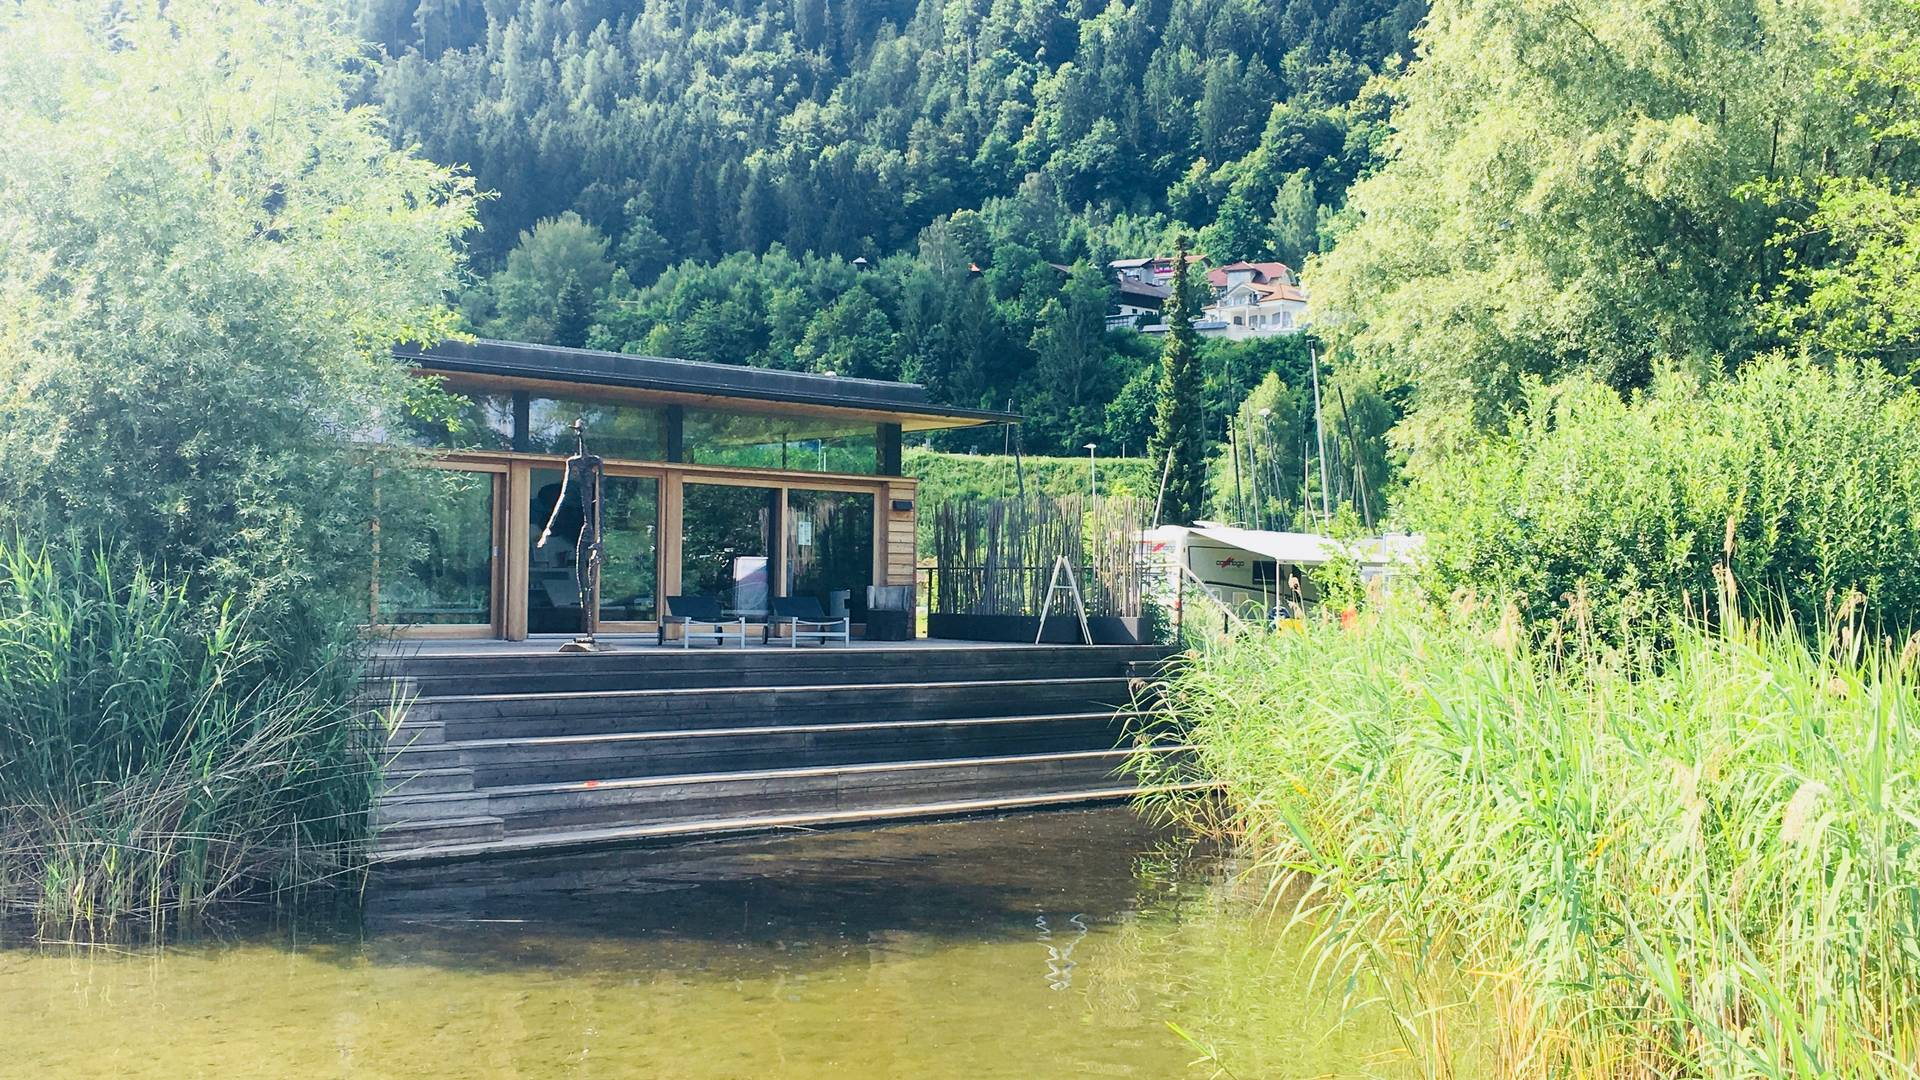 <p>Urlaub im Wohnmobil von Ute Zaworka, Camping Bad Ossiacher See</p>